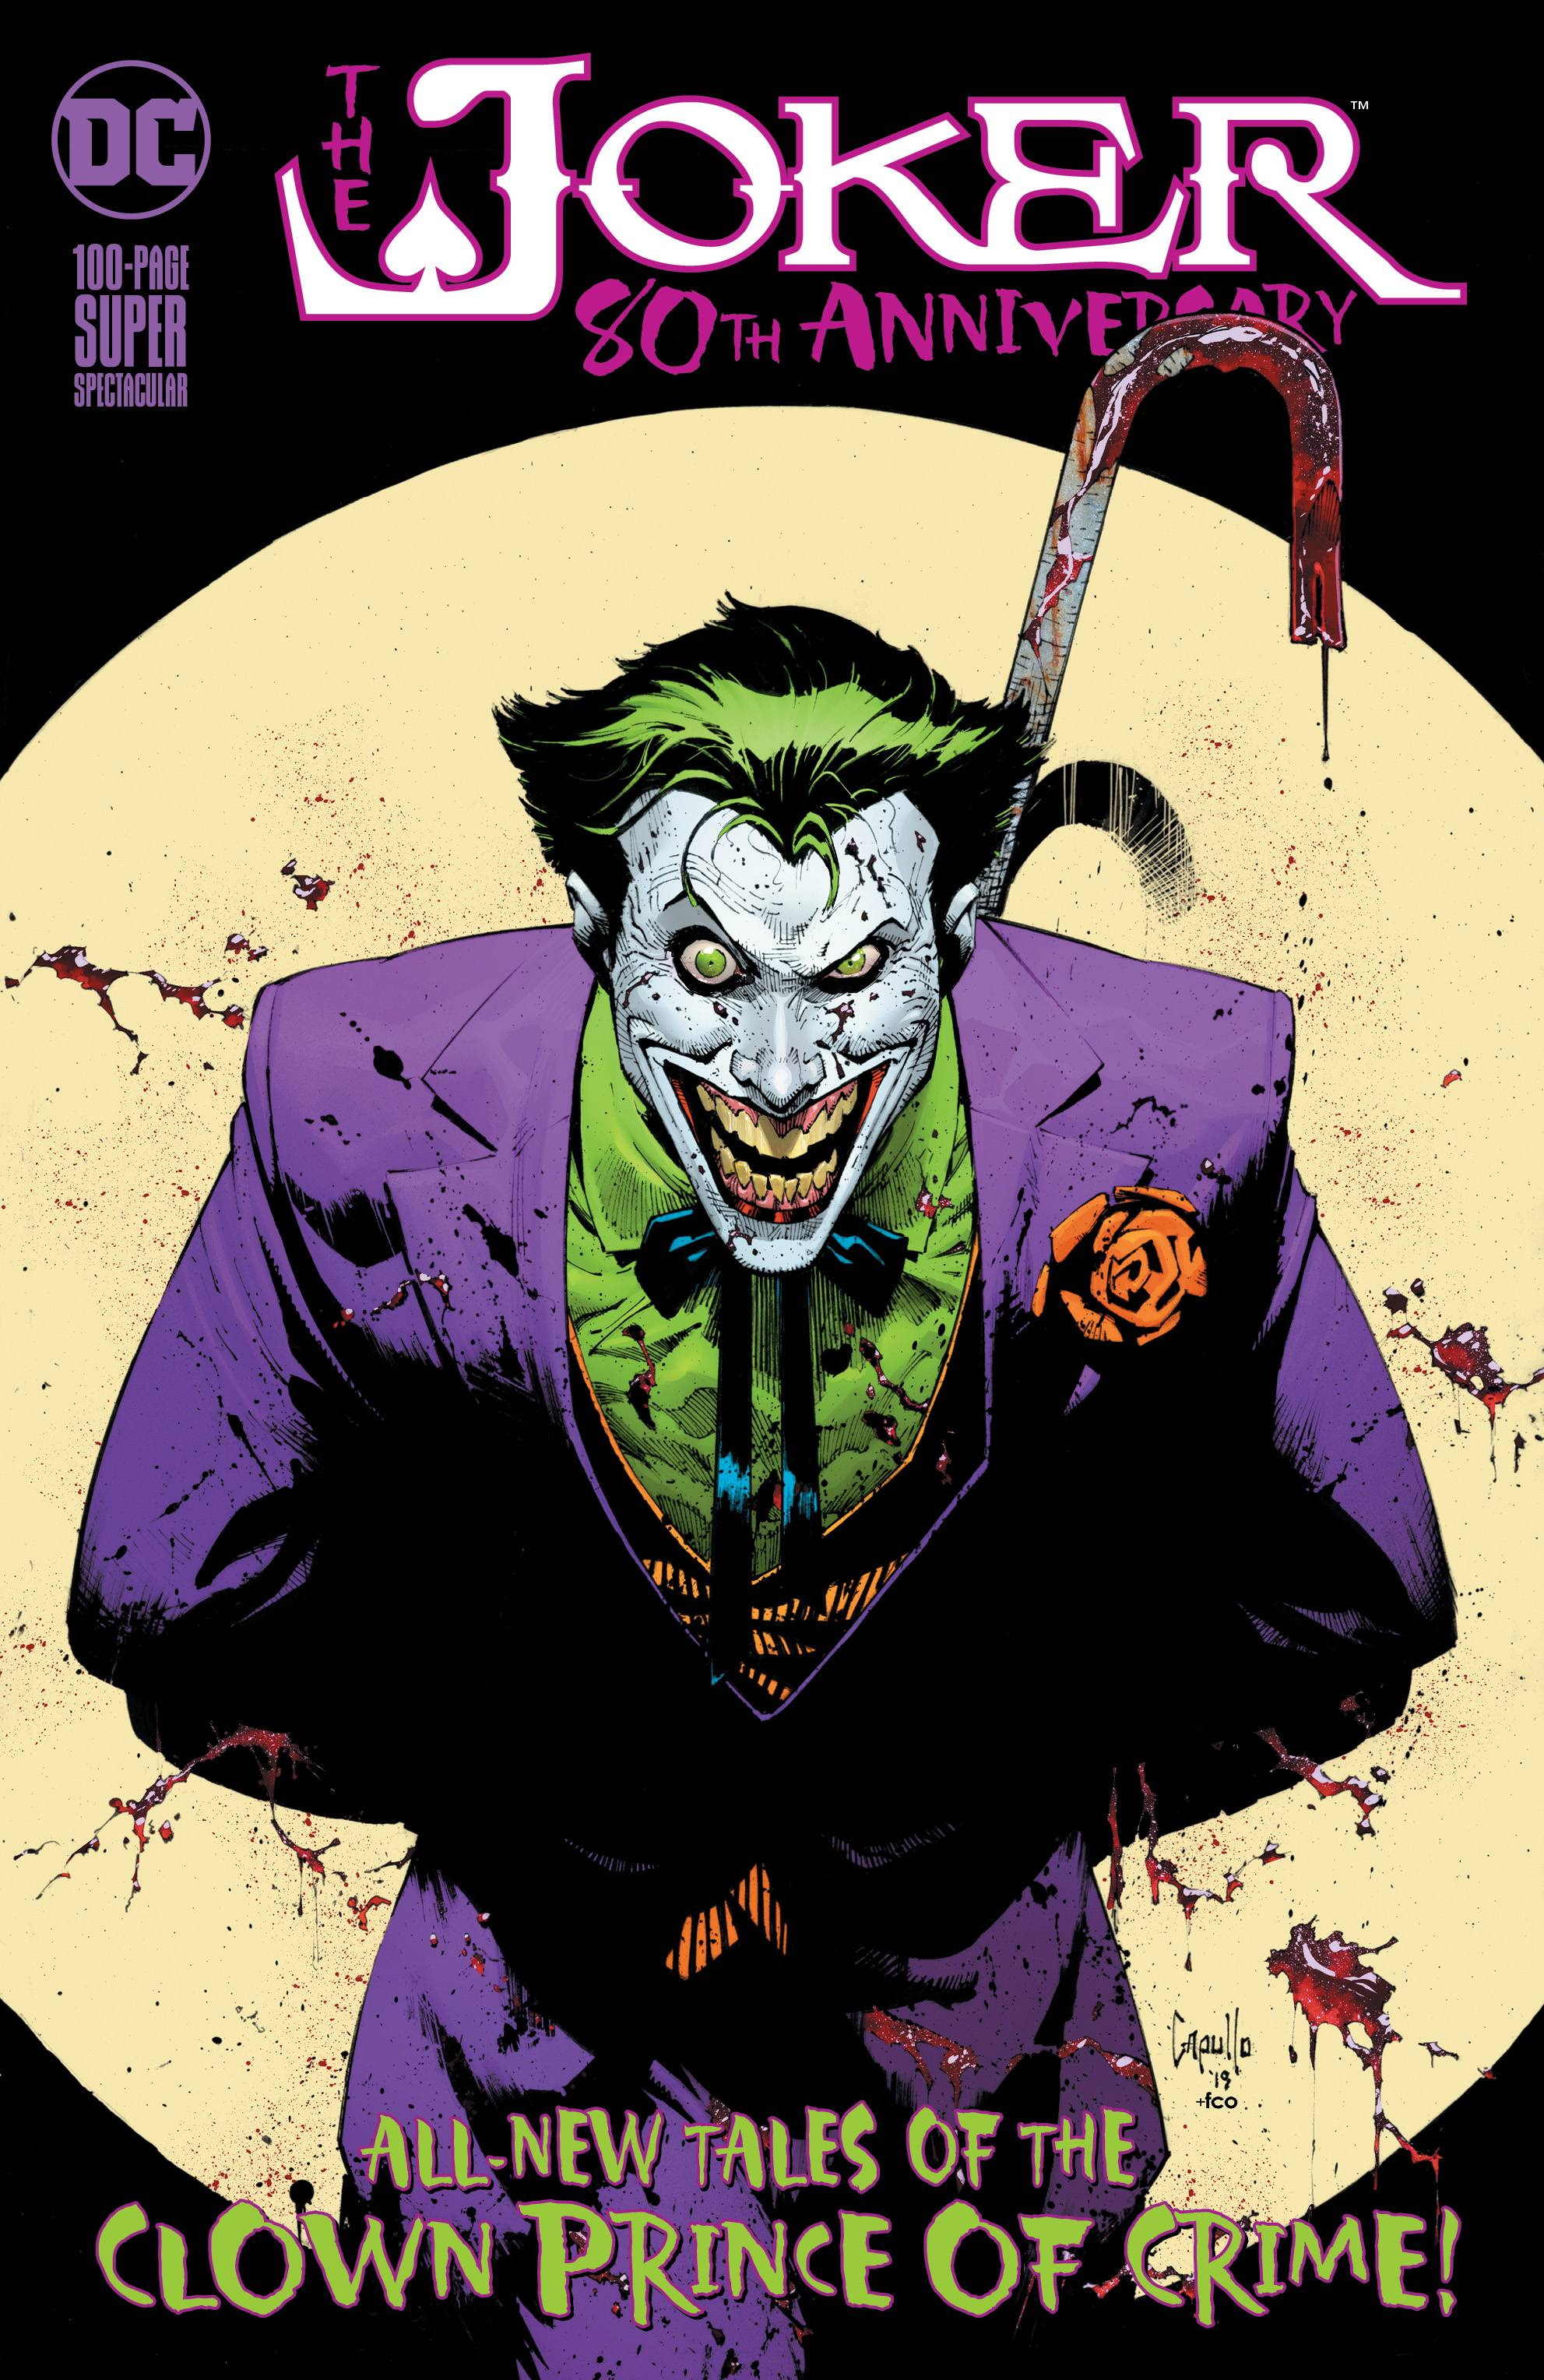 Joker 80th Anniv 100 Page Super Spect #1